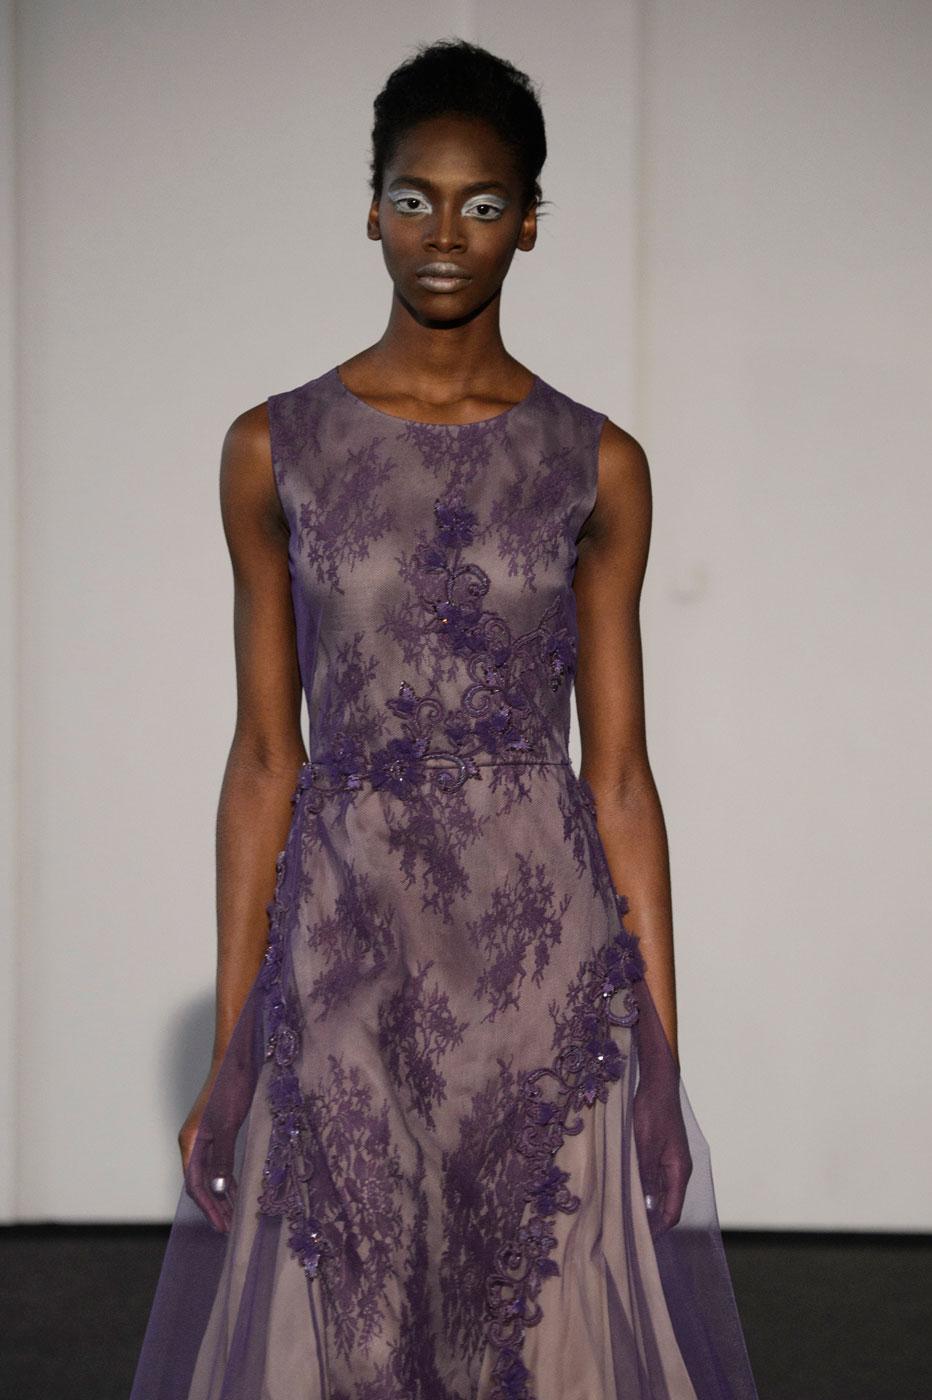 Busardi-fashion-runway-show-haute-couture-paris-spring-2015-the-impression-41